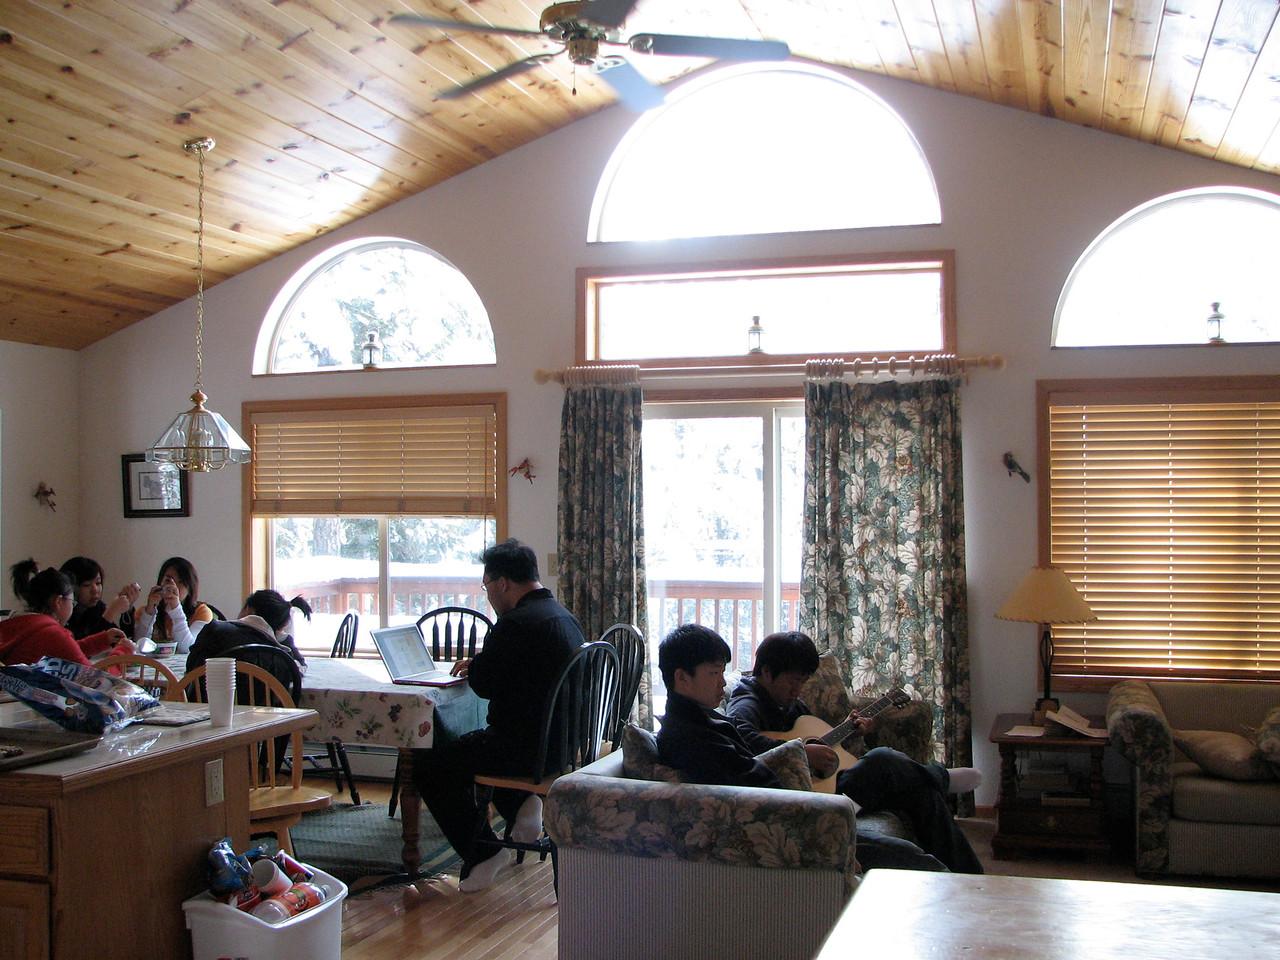 2006 12 23 Sat - Cabin living room